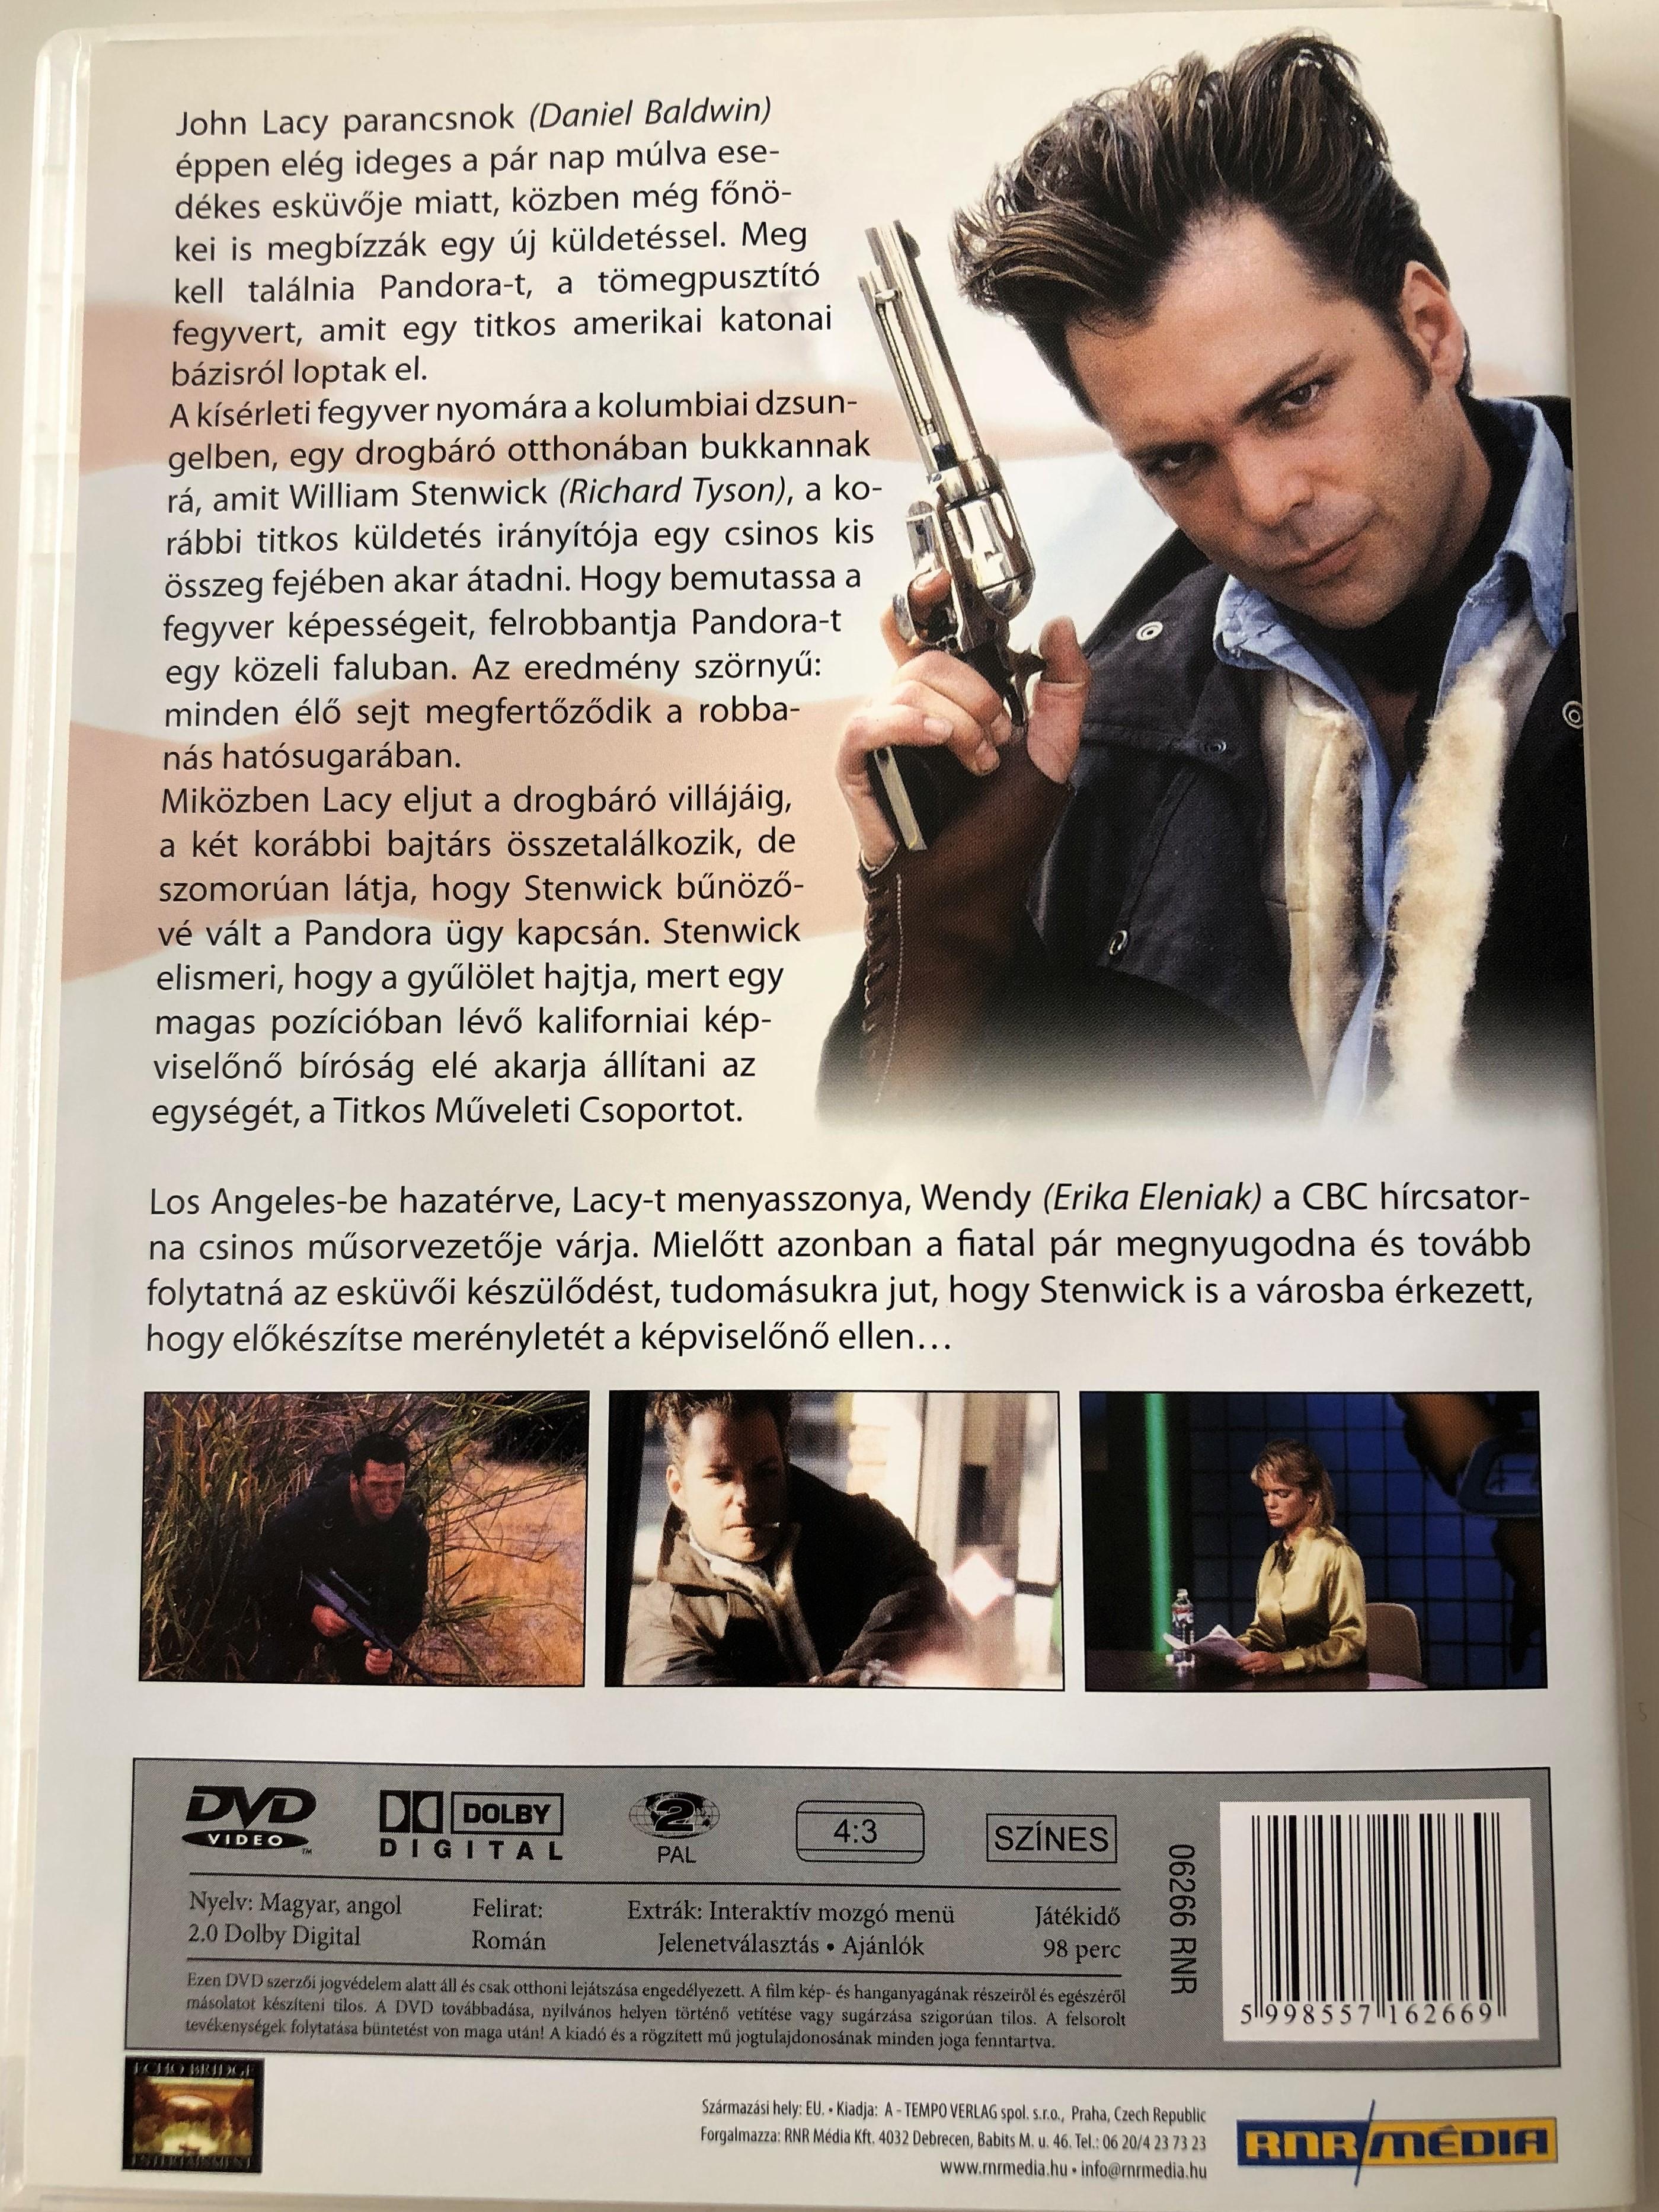 the-pandora-project-dvd-1998-pandora-hadm-velet-directed-by-john-terlesky-jim-wynorski-starring-daniel-baldwin-erika-eleniak-richard-tyson-tony-todd-bo-jackson-jeff-yagher-2-.jpg